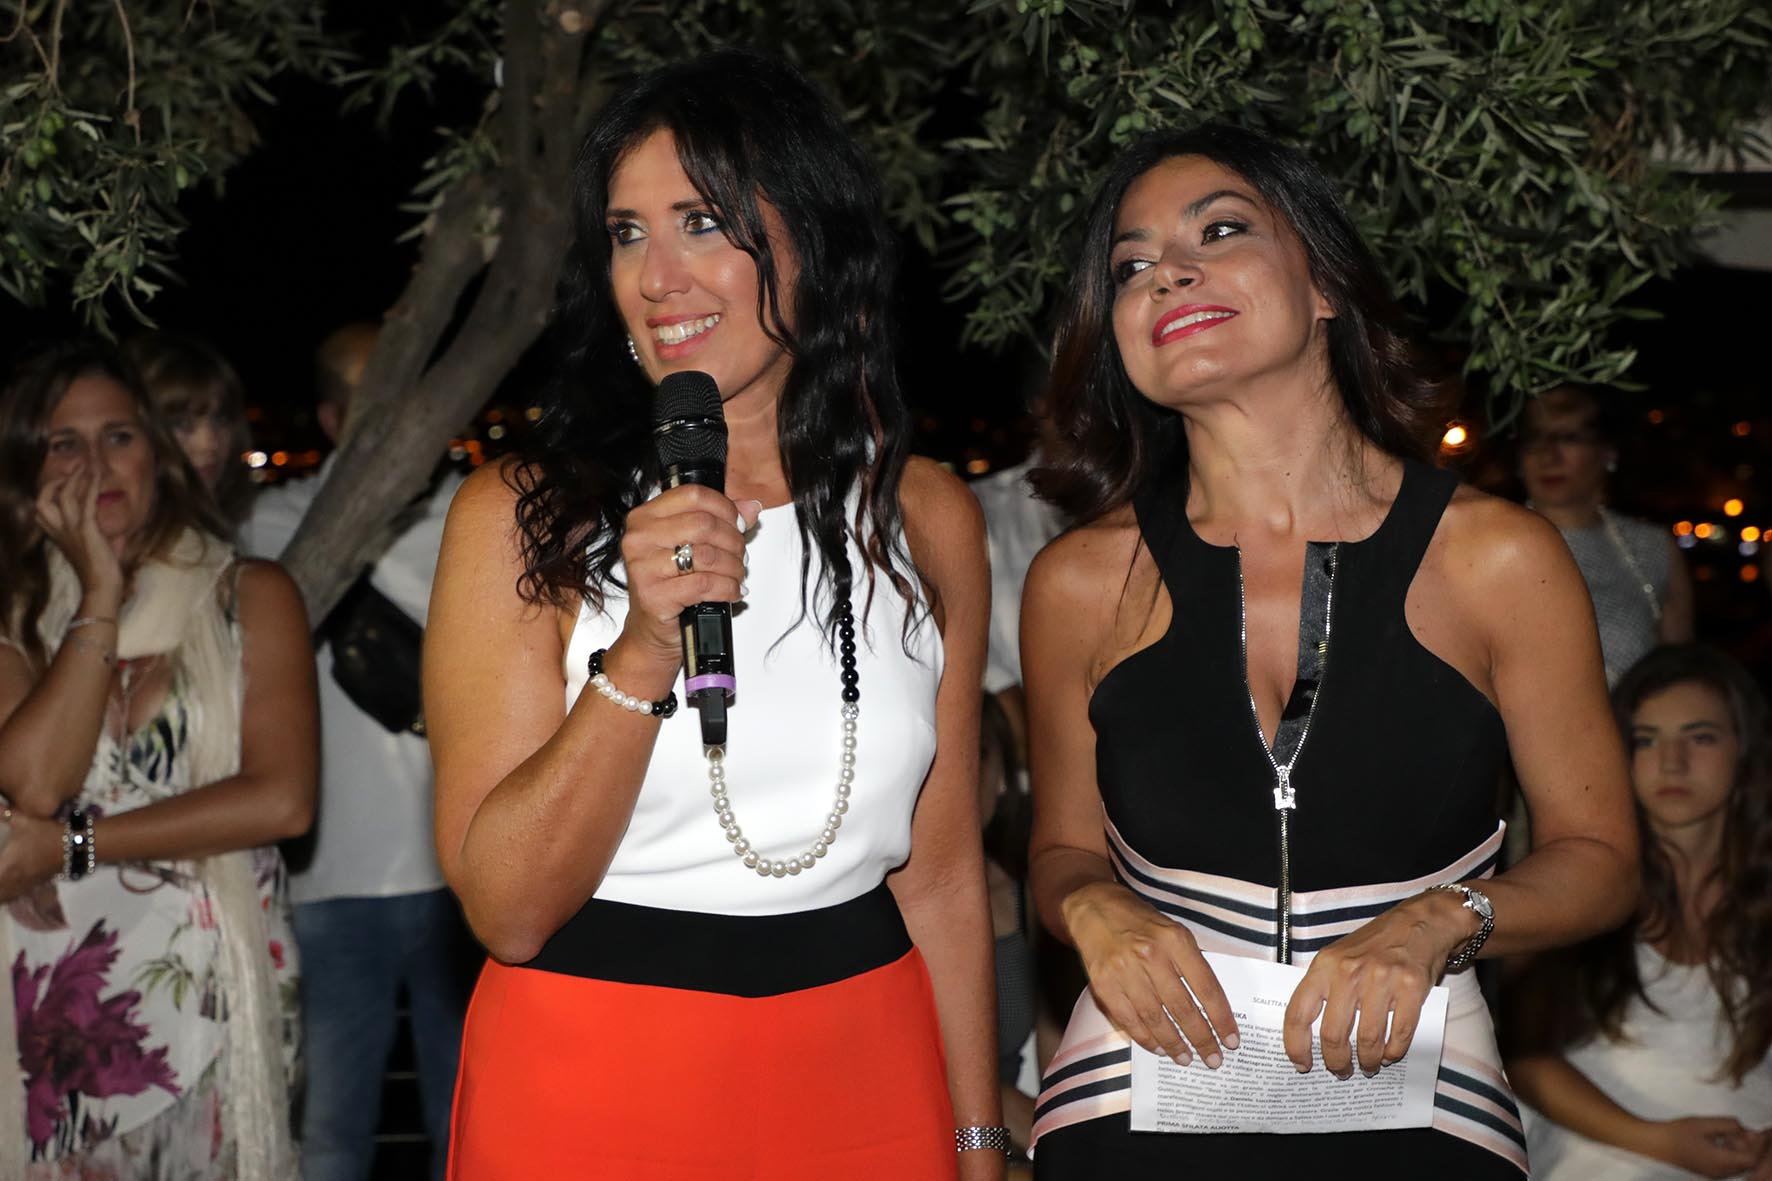 Daniela Lucchesi e Marika Micalizzi